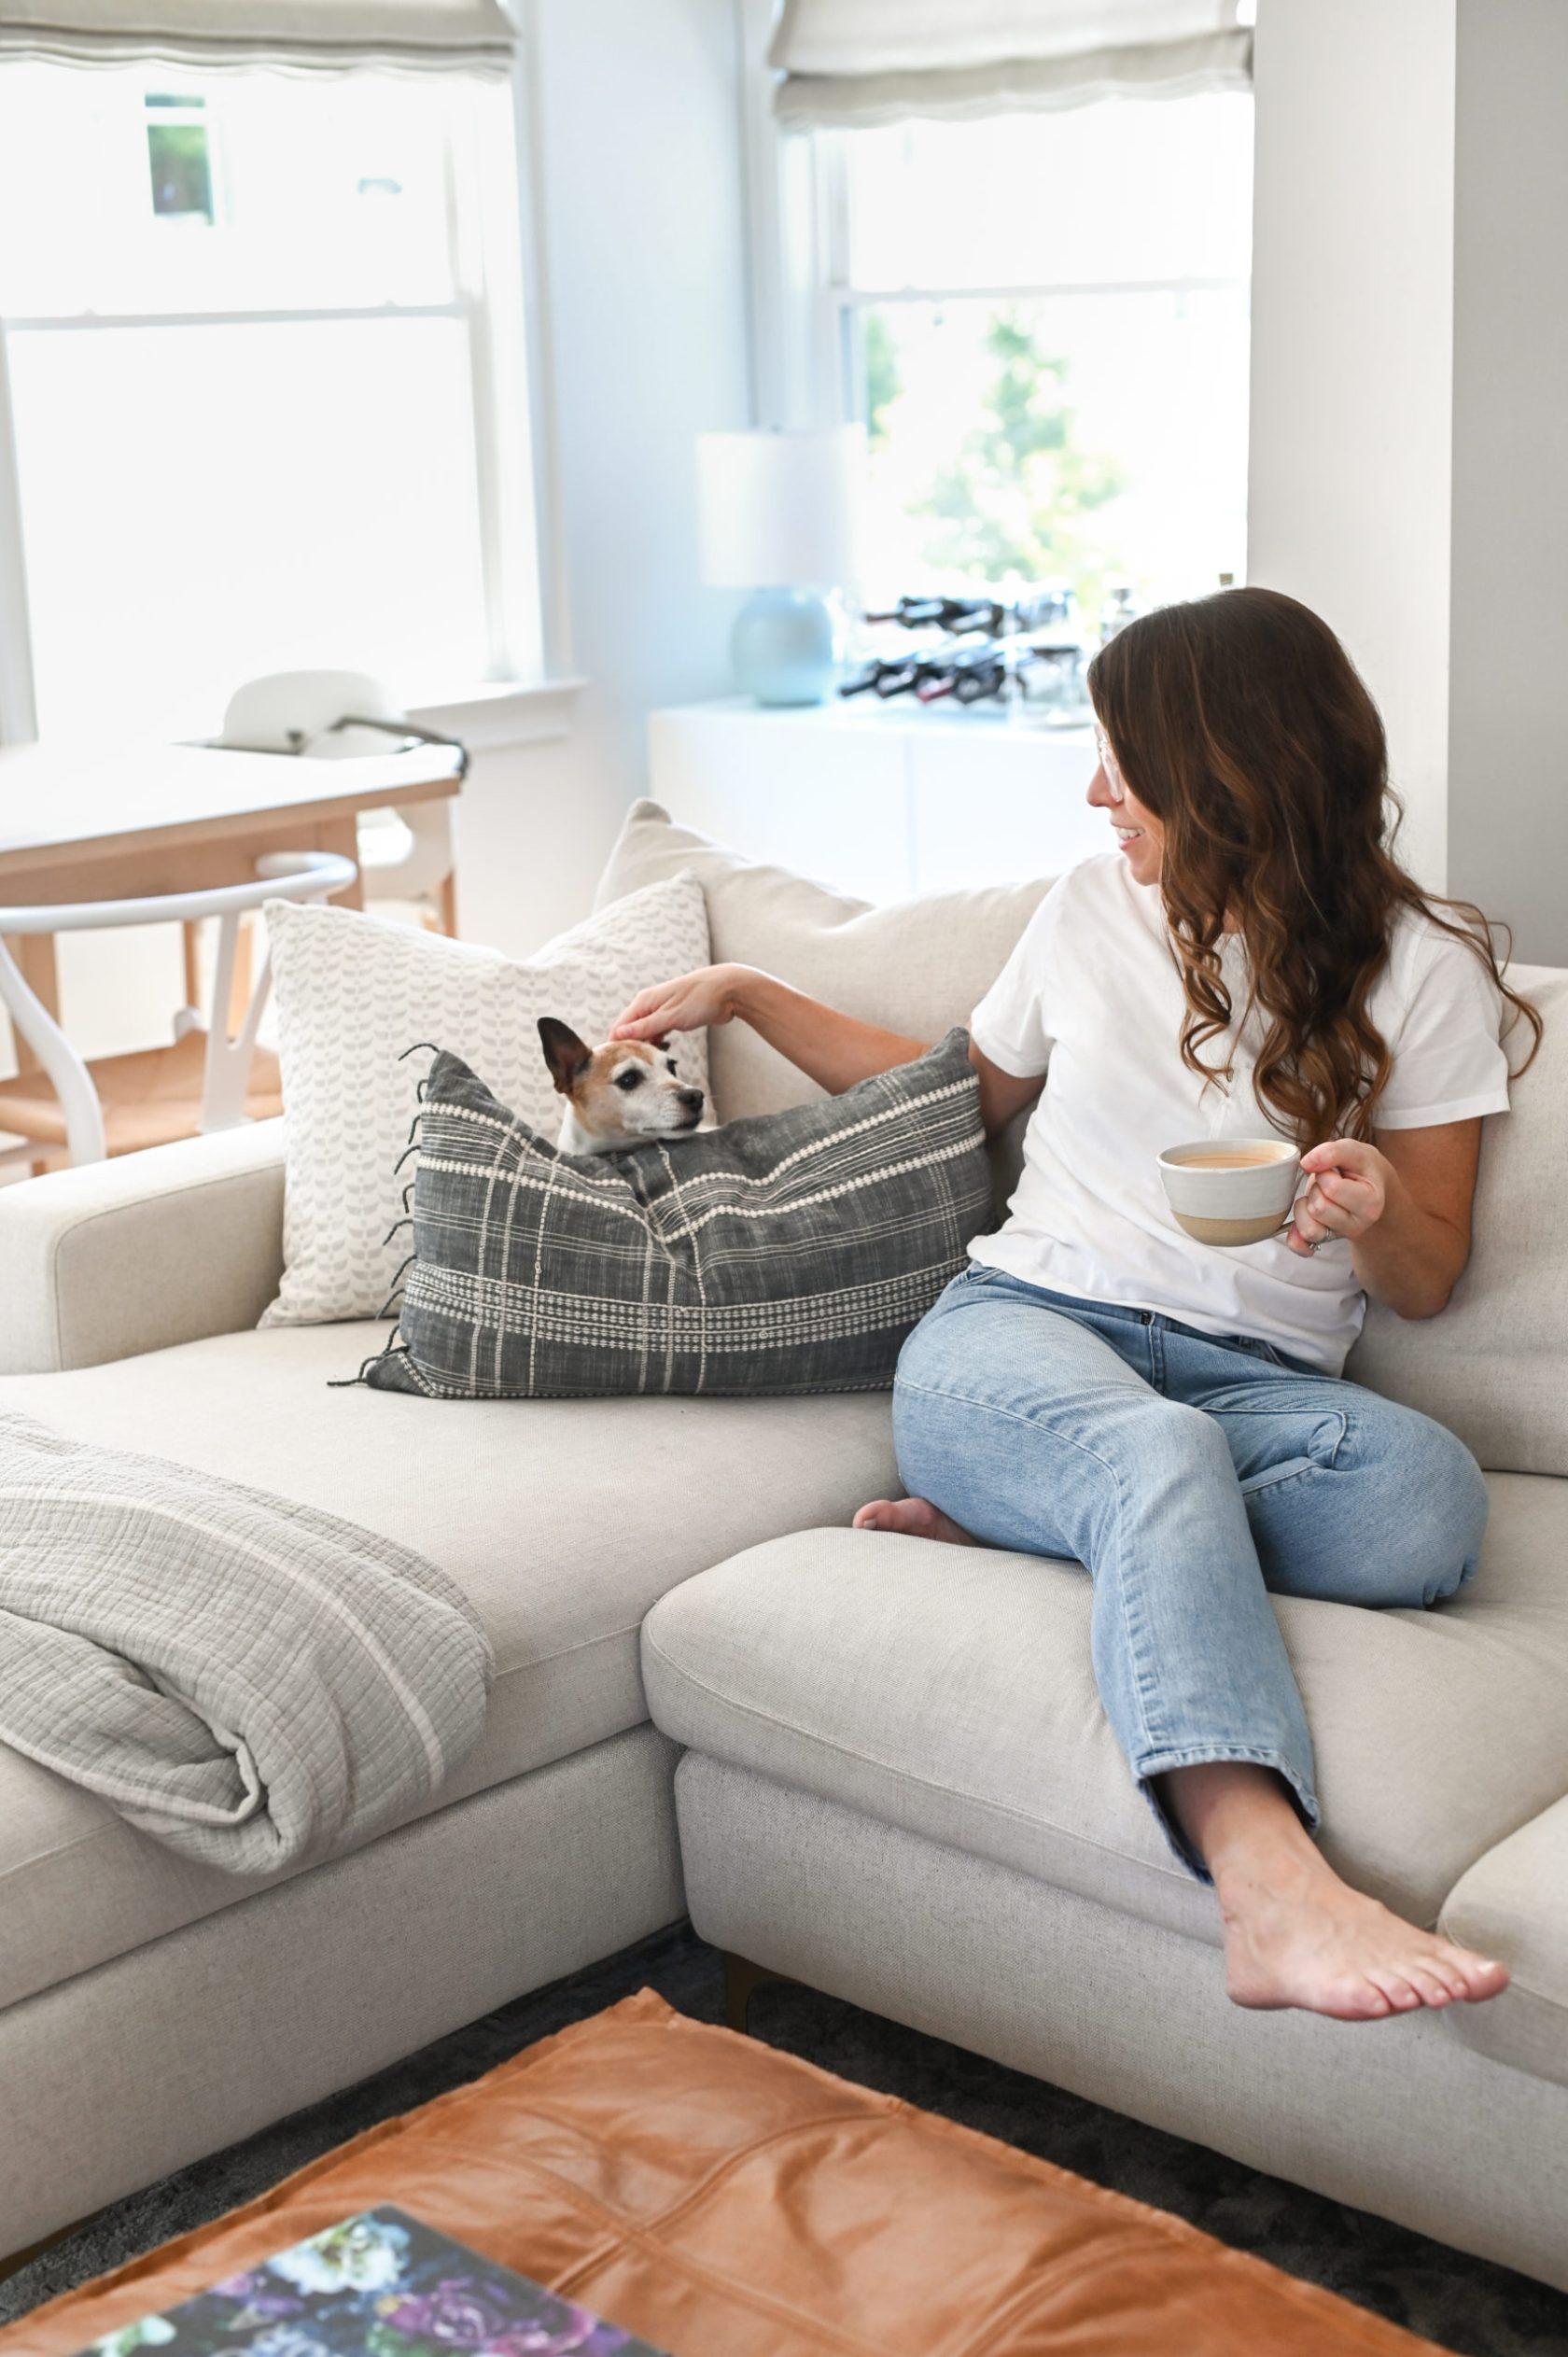 Coffee on the sofa with dog